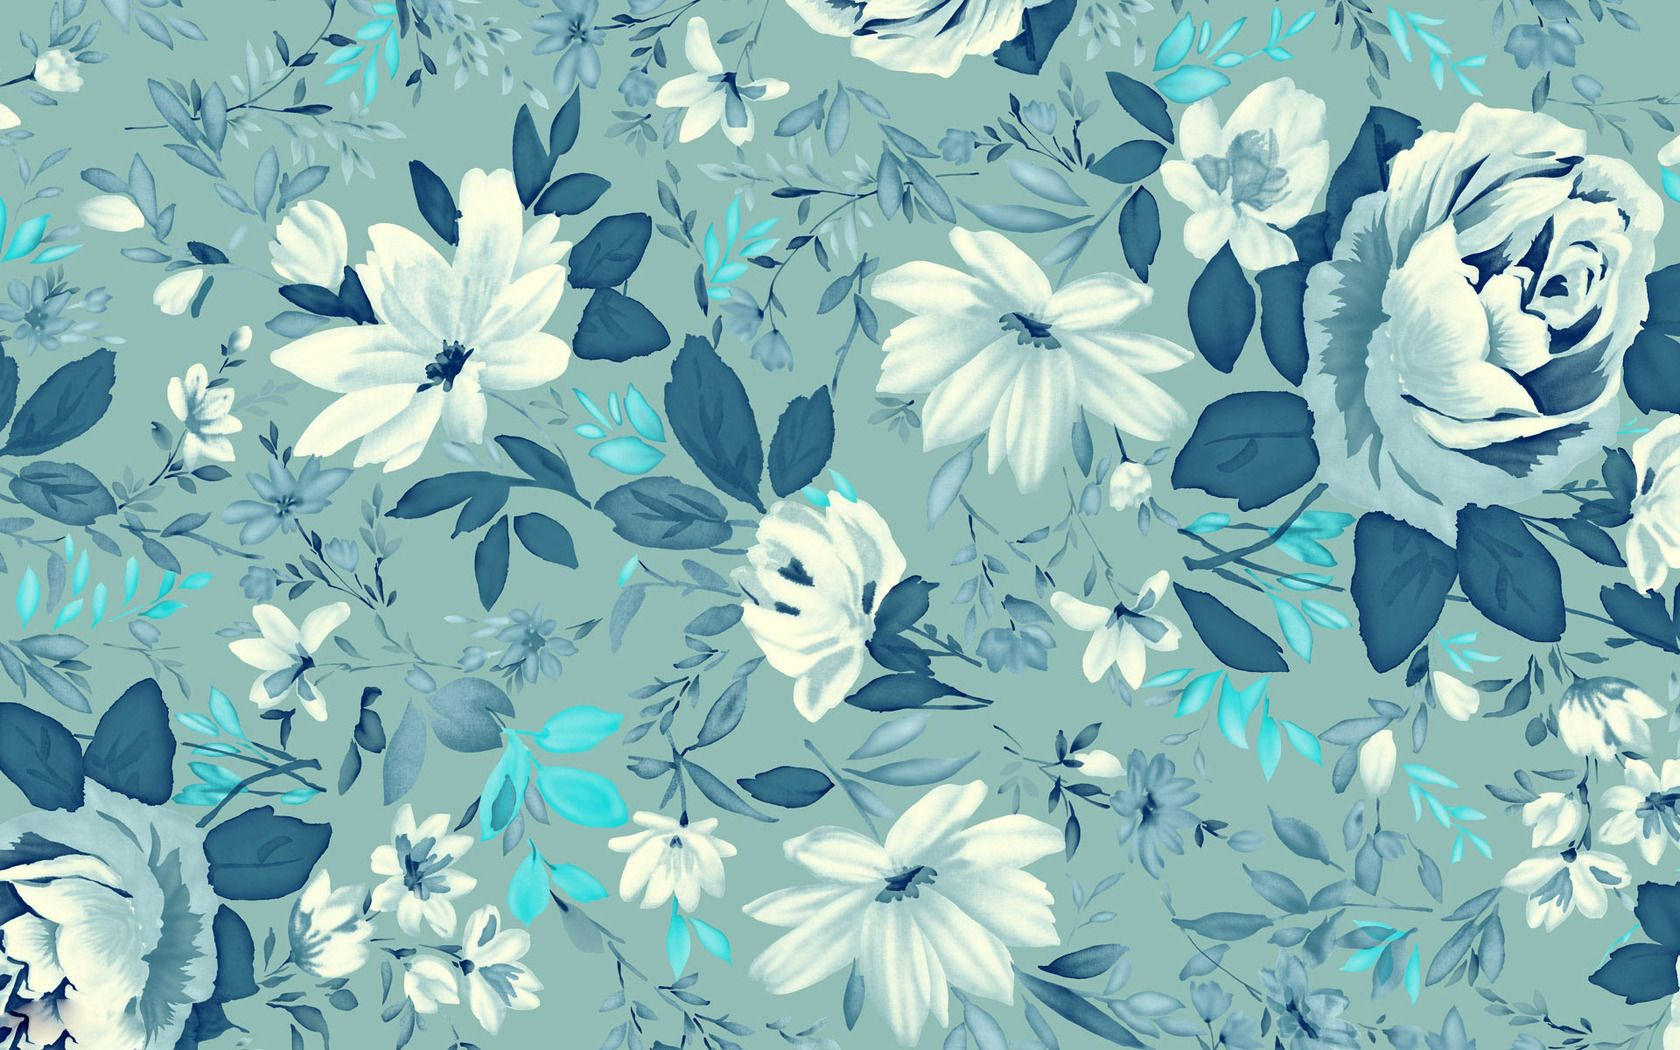 Vintage Floral Pattern Wallpaper Fondo De Pantalla De Flores Vintage Empapelado Floral Tapices Florales De Epoca